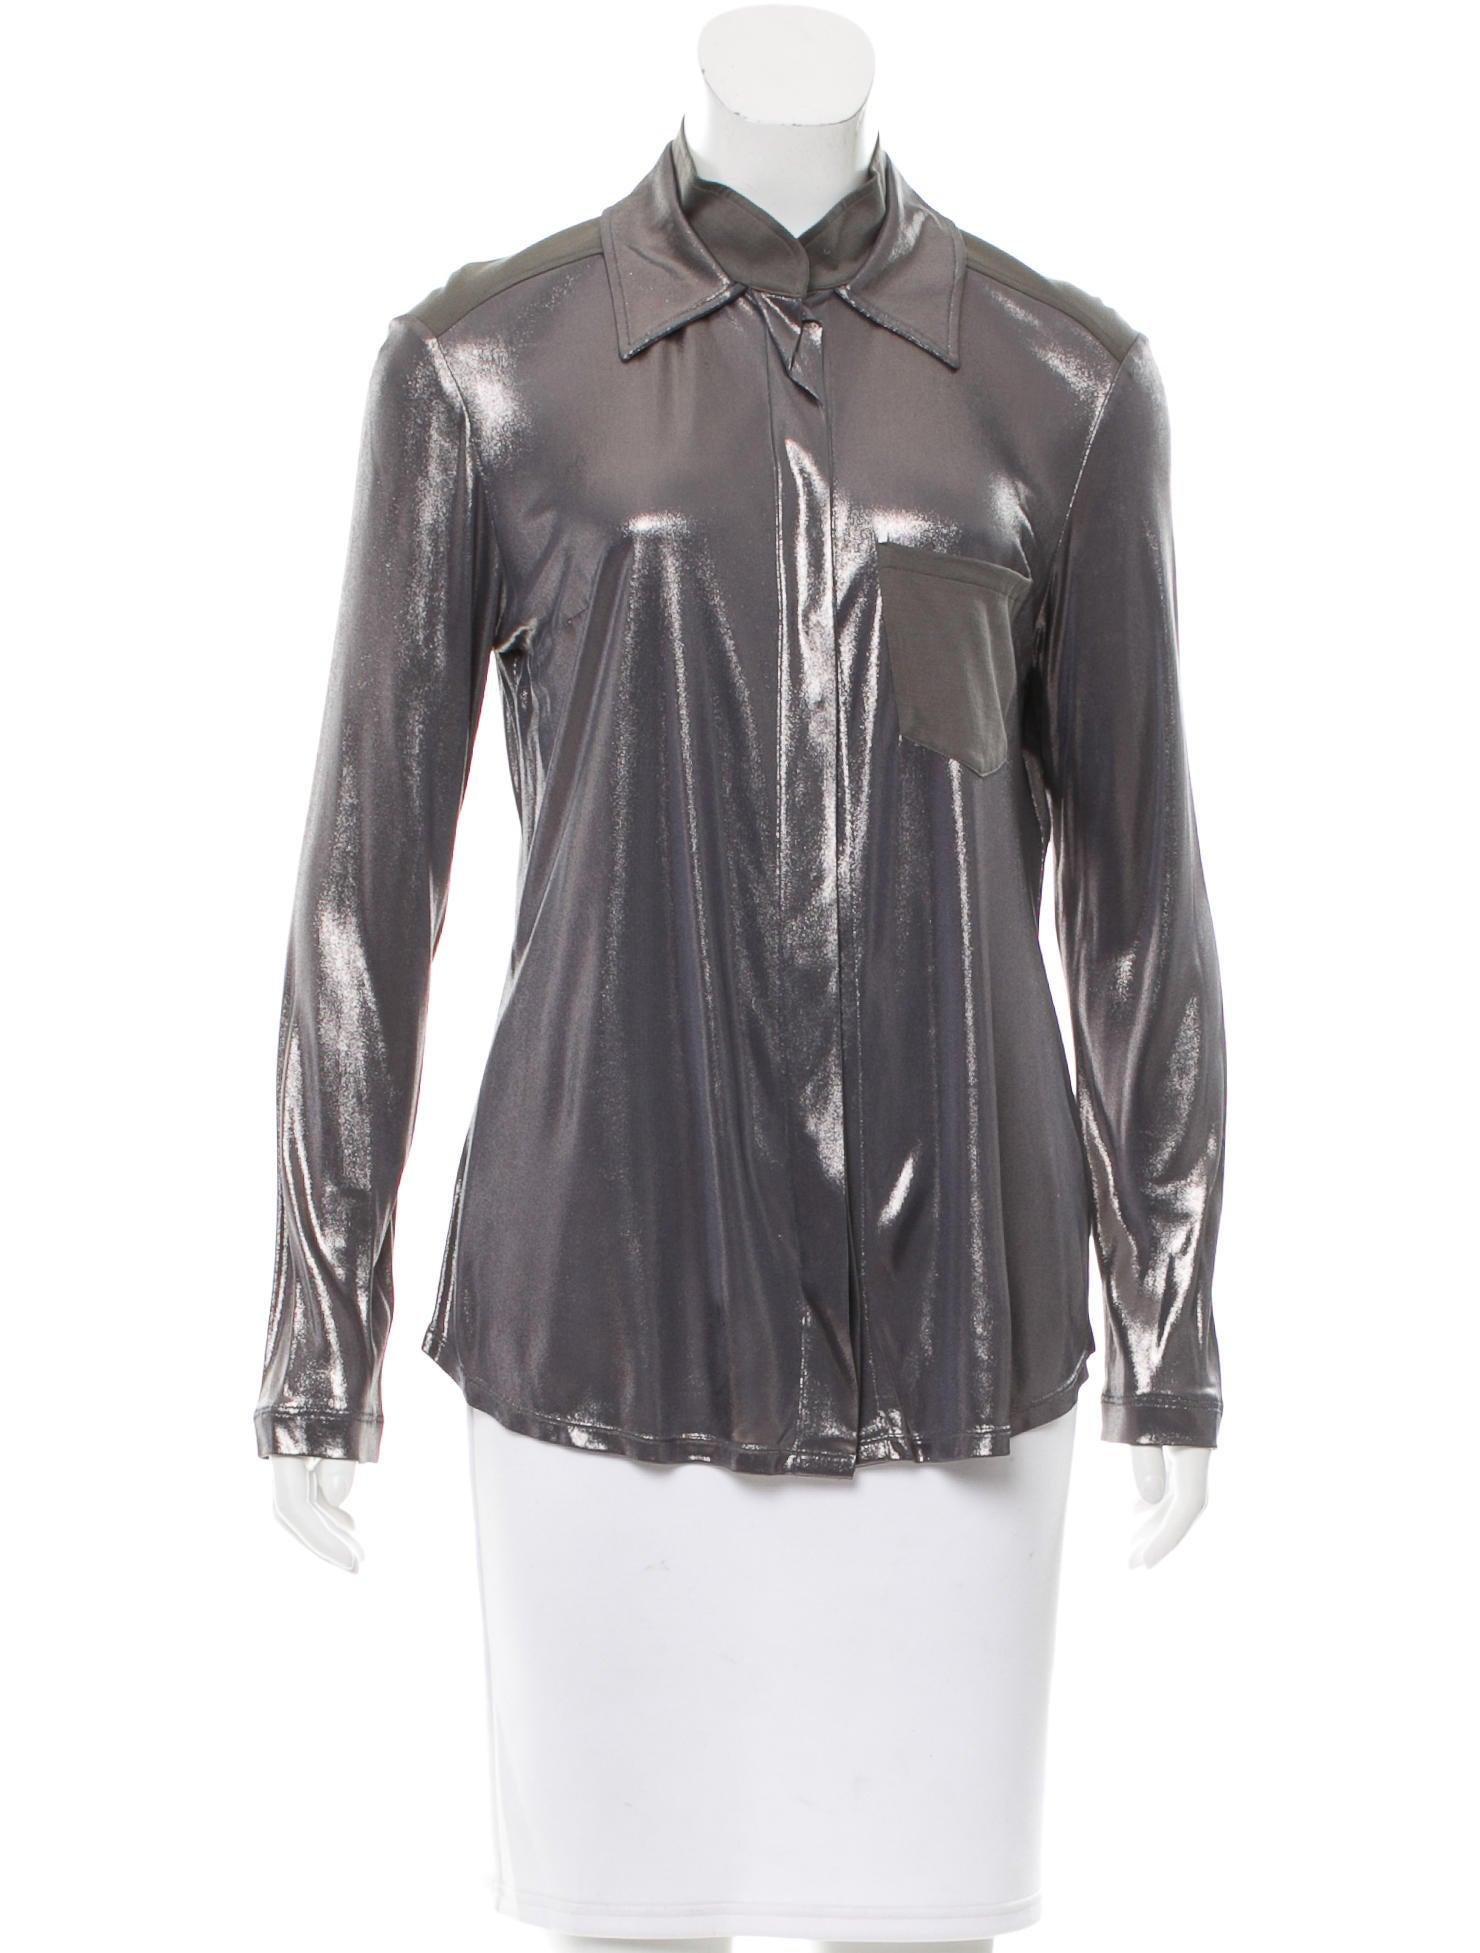 Christian dior metallic button up top clothing for Christian dior button up shirt